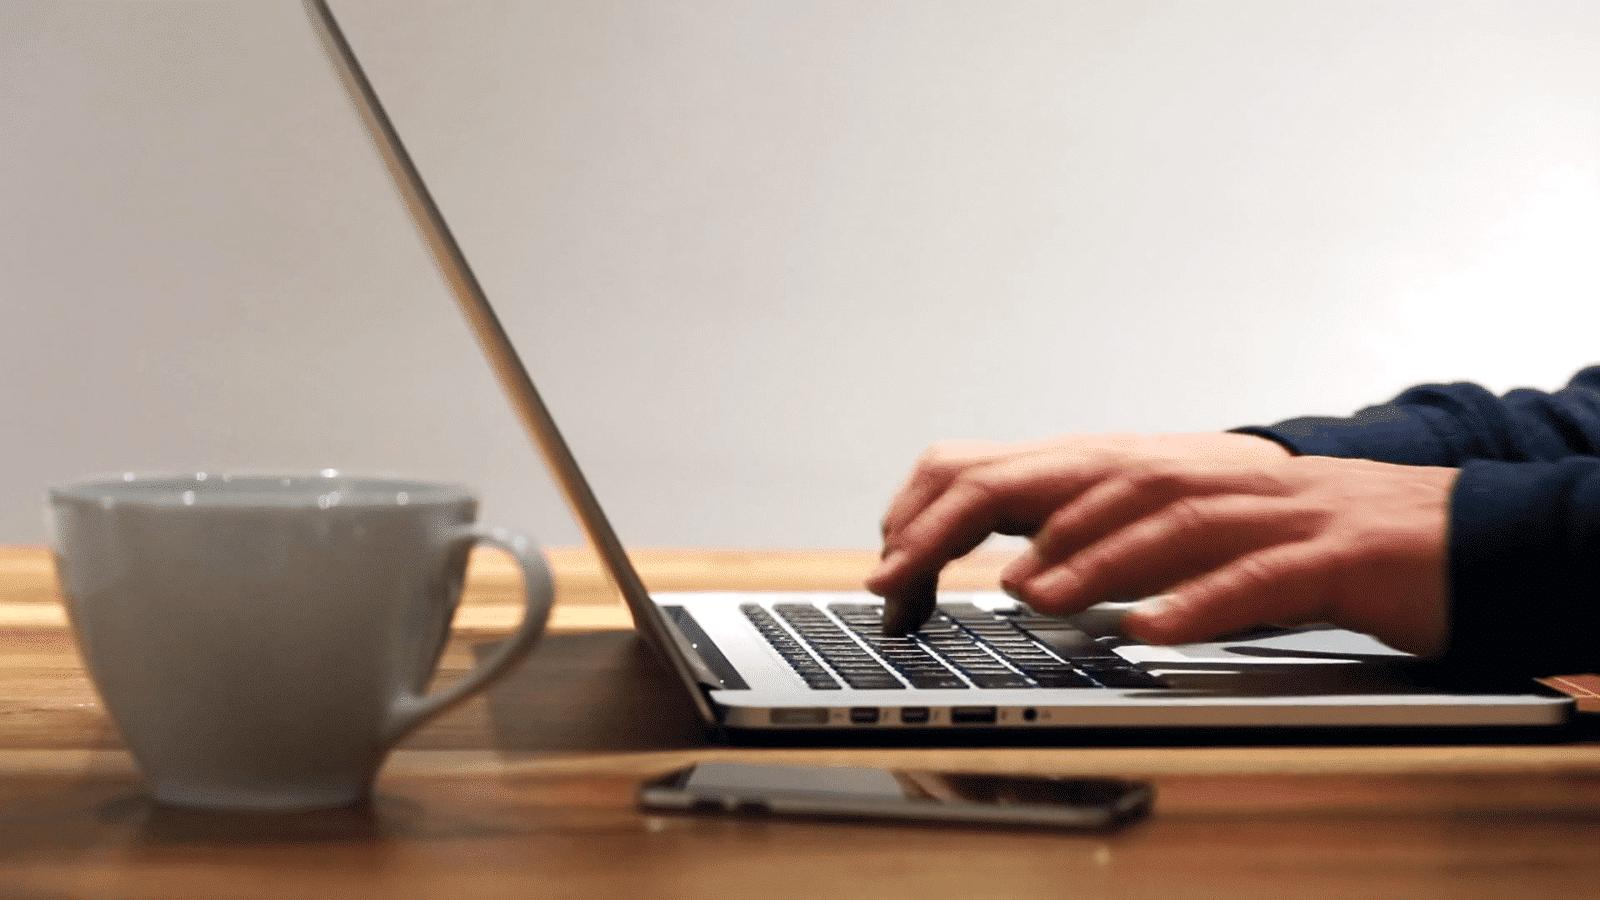 Sirope-Historias-Articulo opinion-web rentable-usabilidad-adecuacion